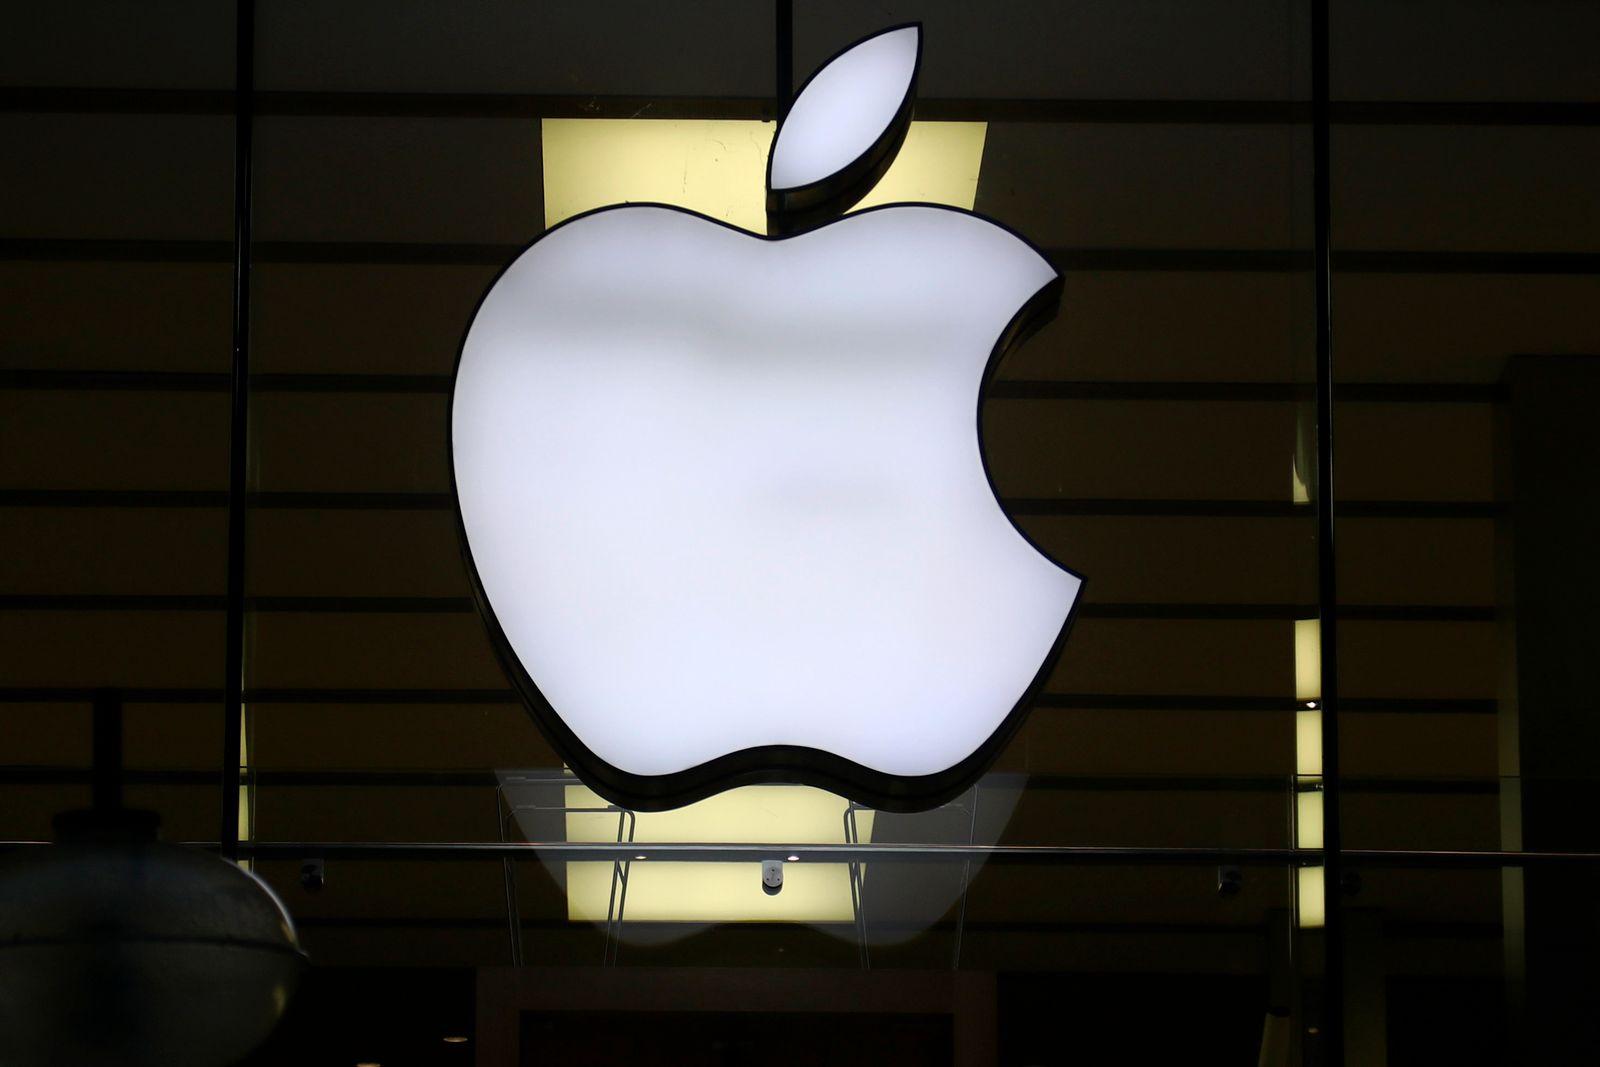 Apple iPhone Child Abuse